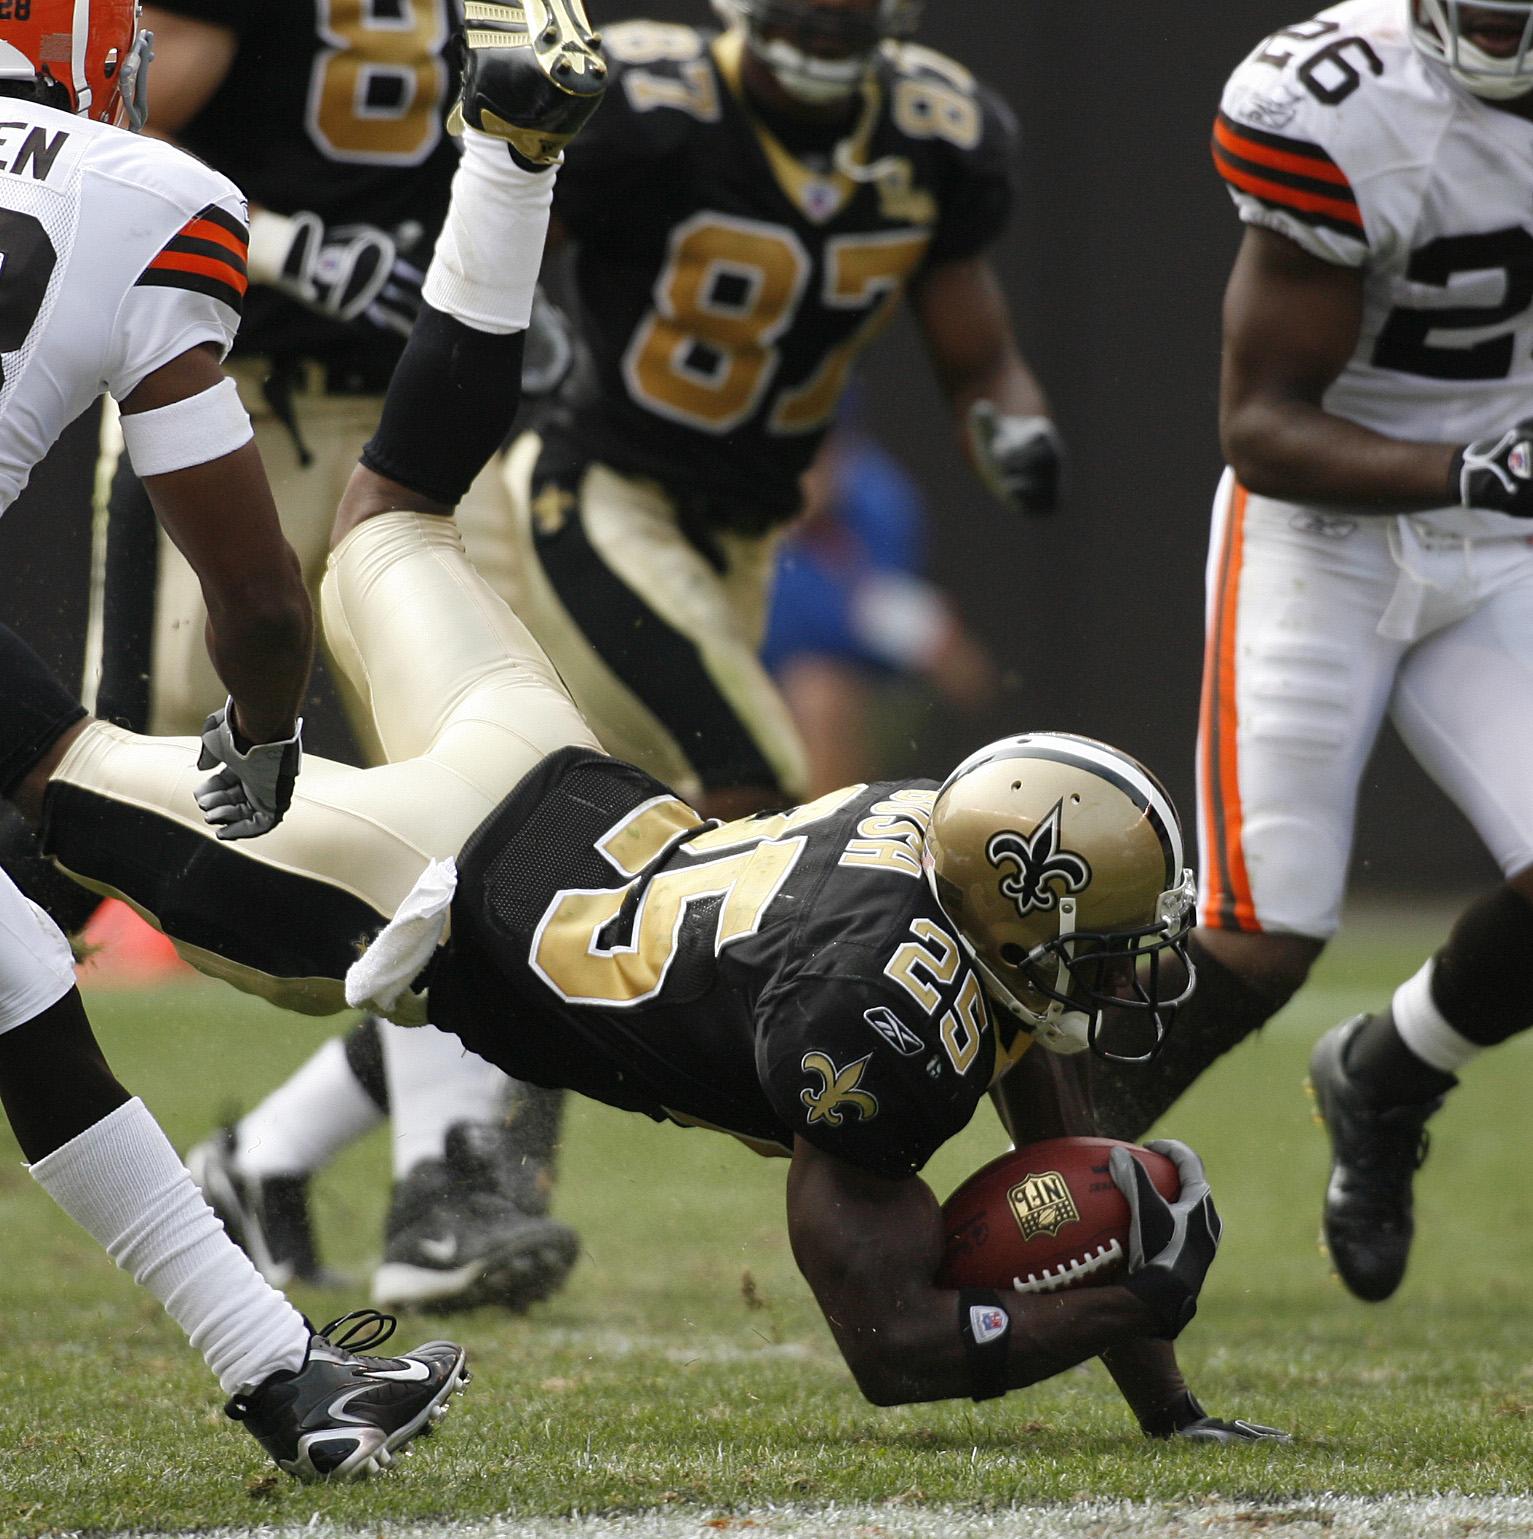 NFL: Saints at Browns 19-14